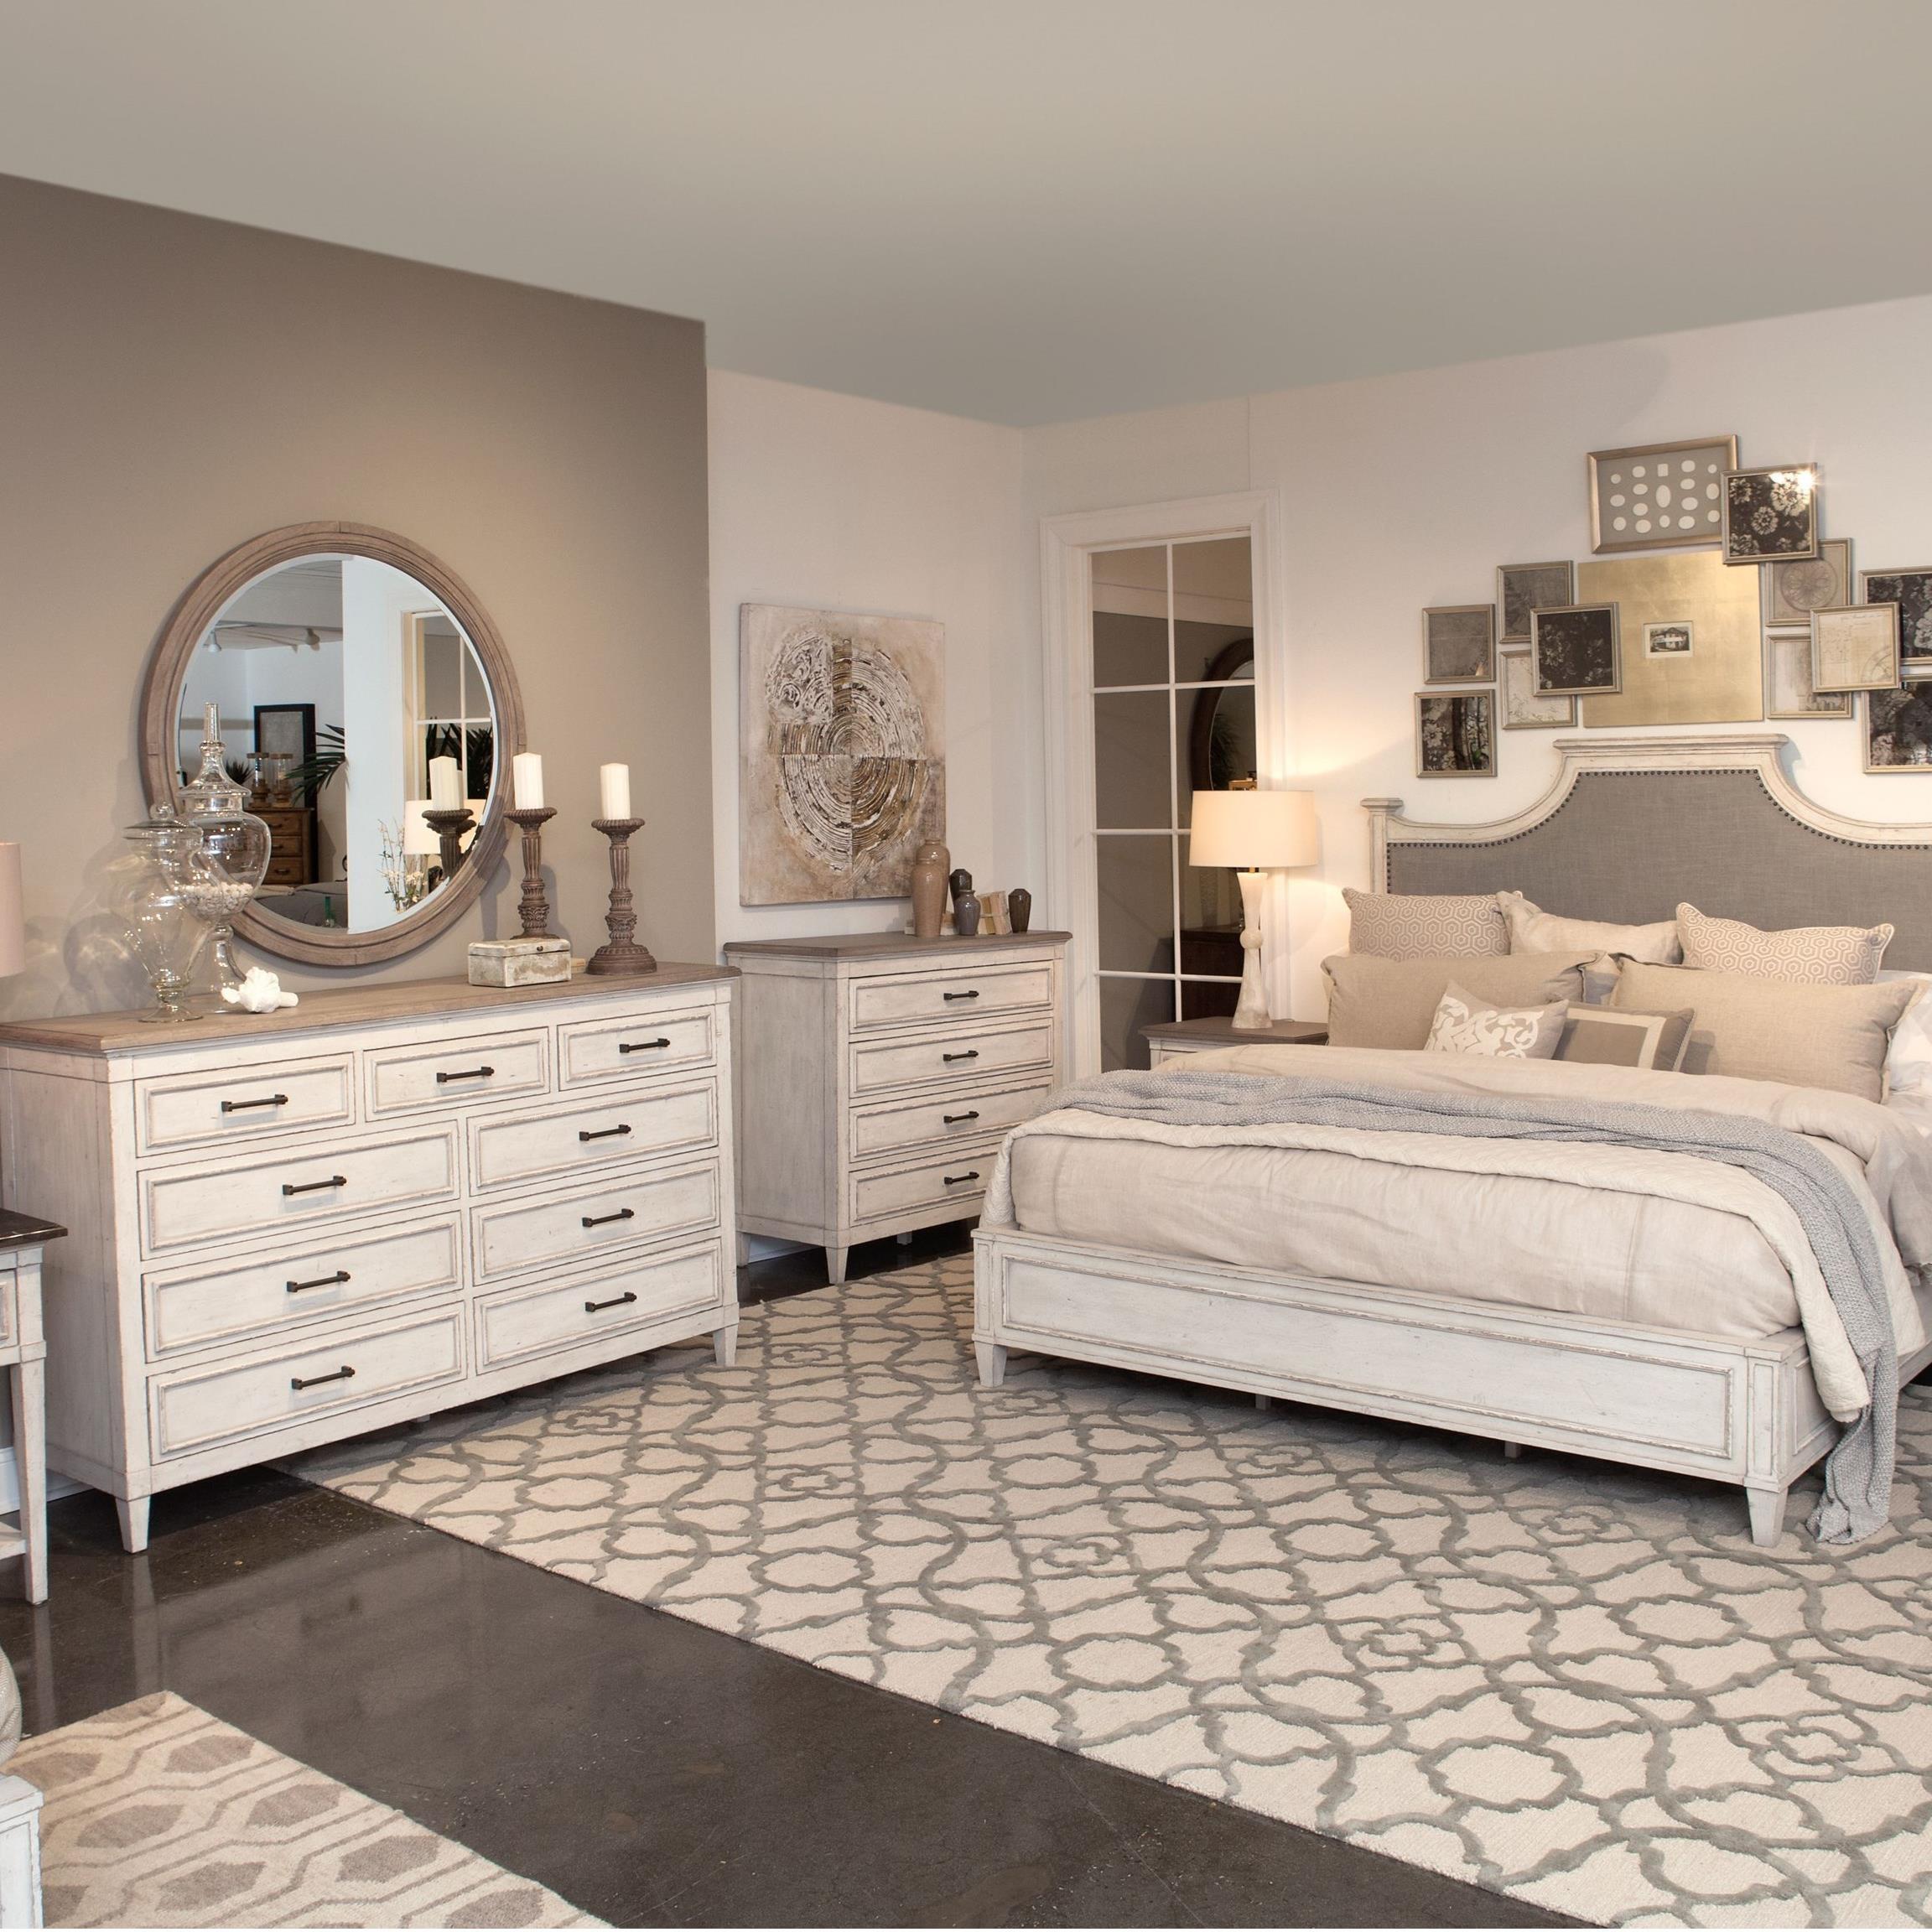 Bassett Room Planner: Bassett Bella Cottage 9 Drawer Dresser With Weathered